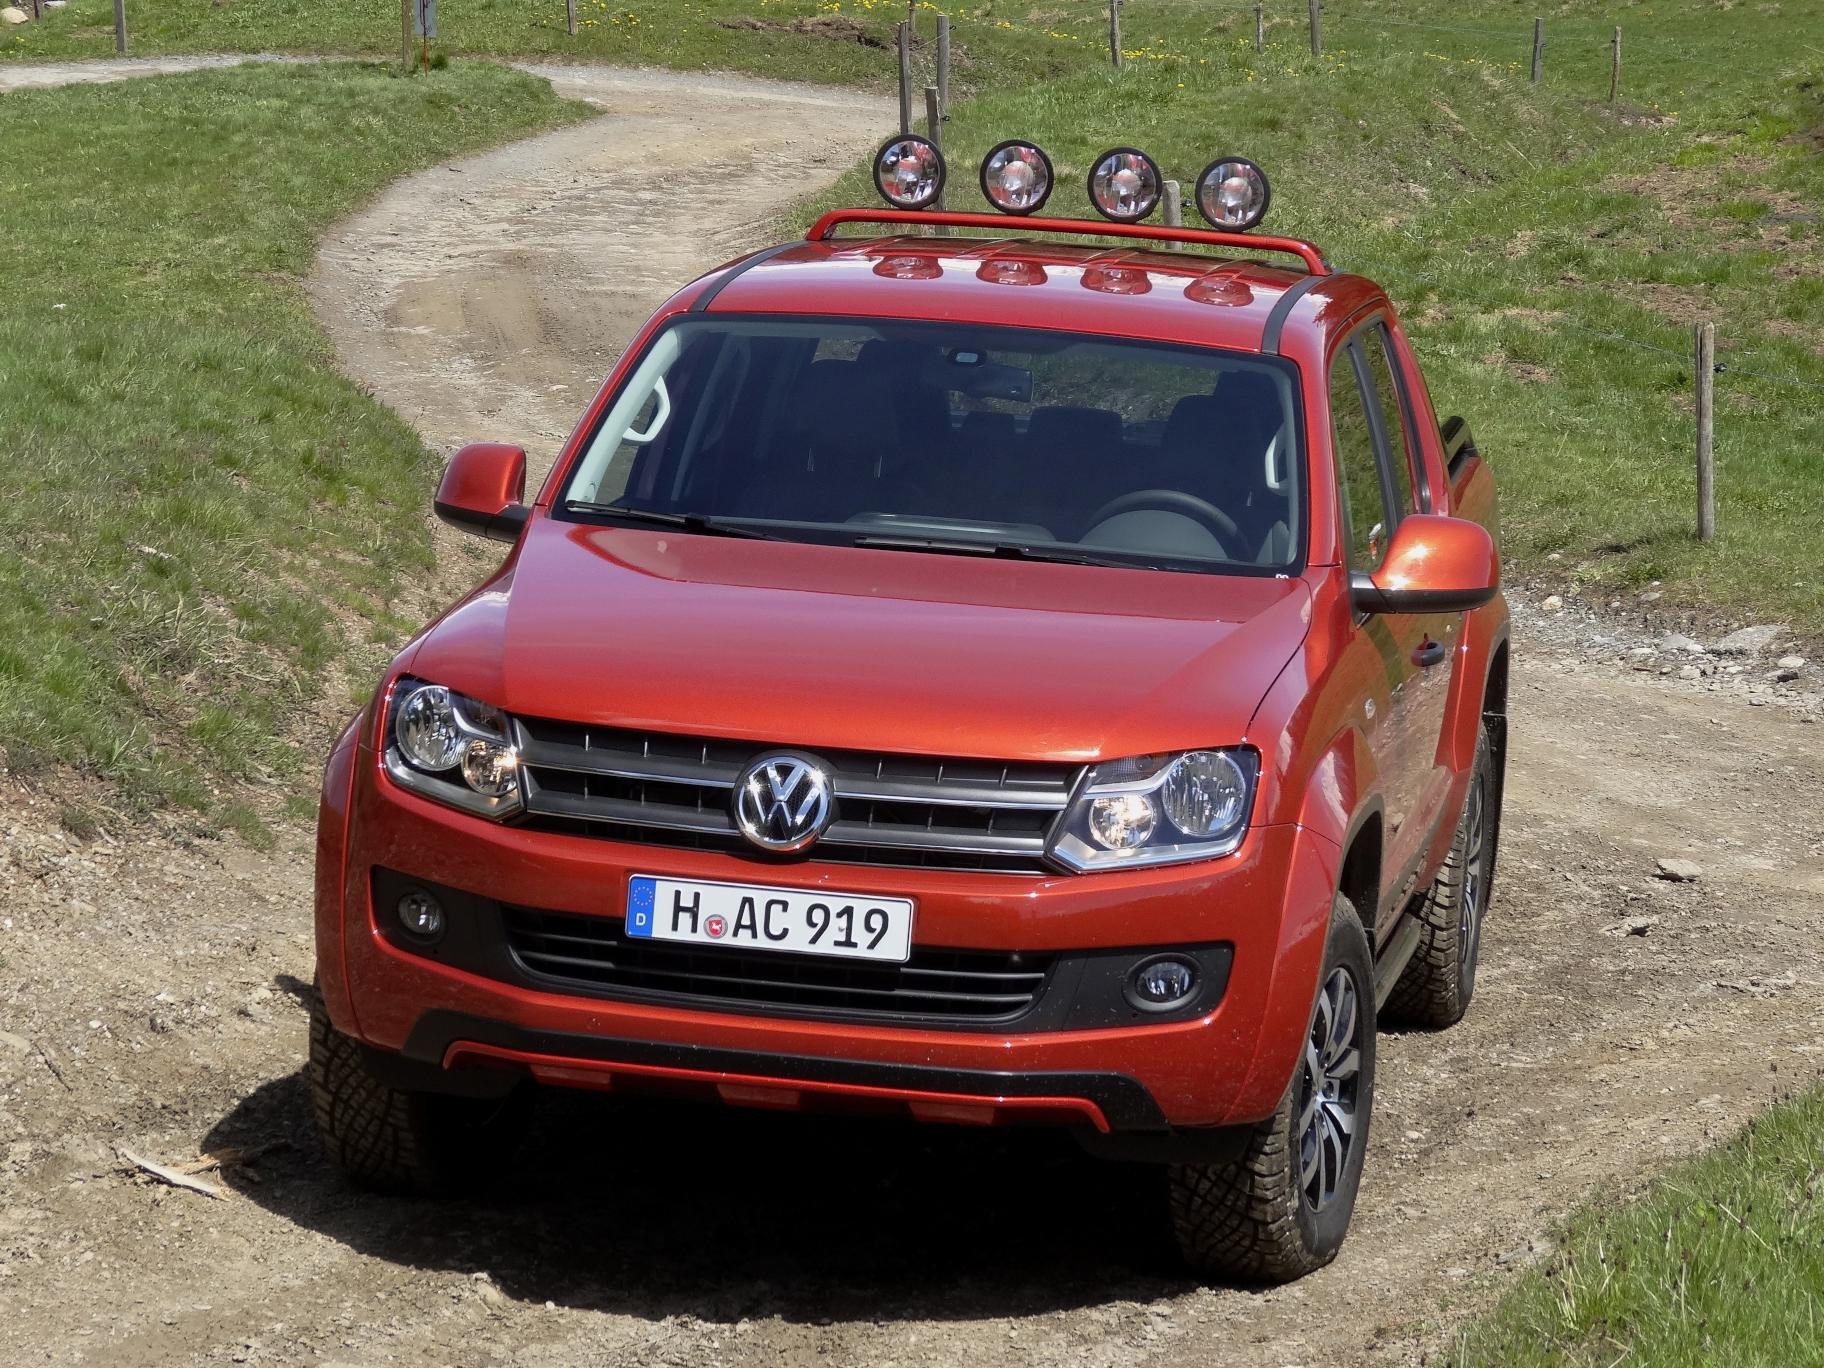 Volkswagen Amarok Canyon Figurbetont Auto Me nportal Net